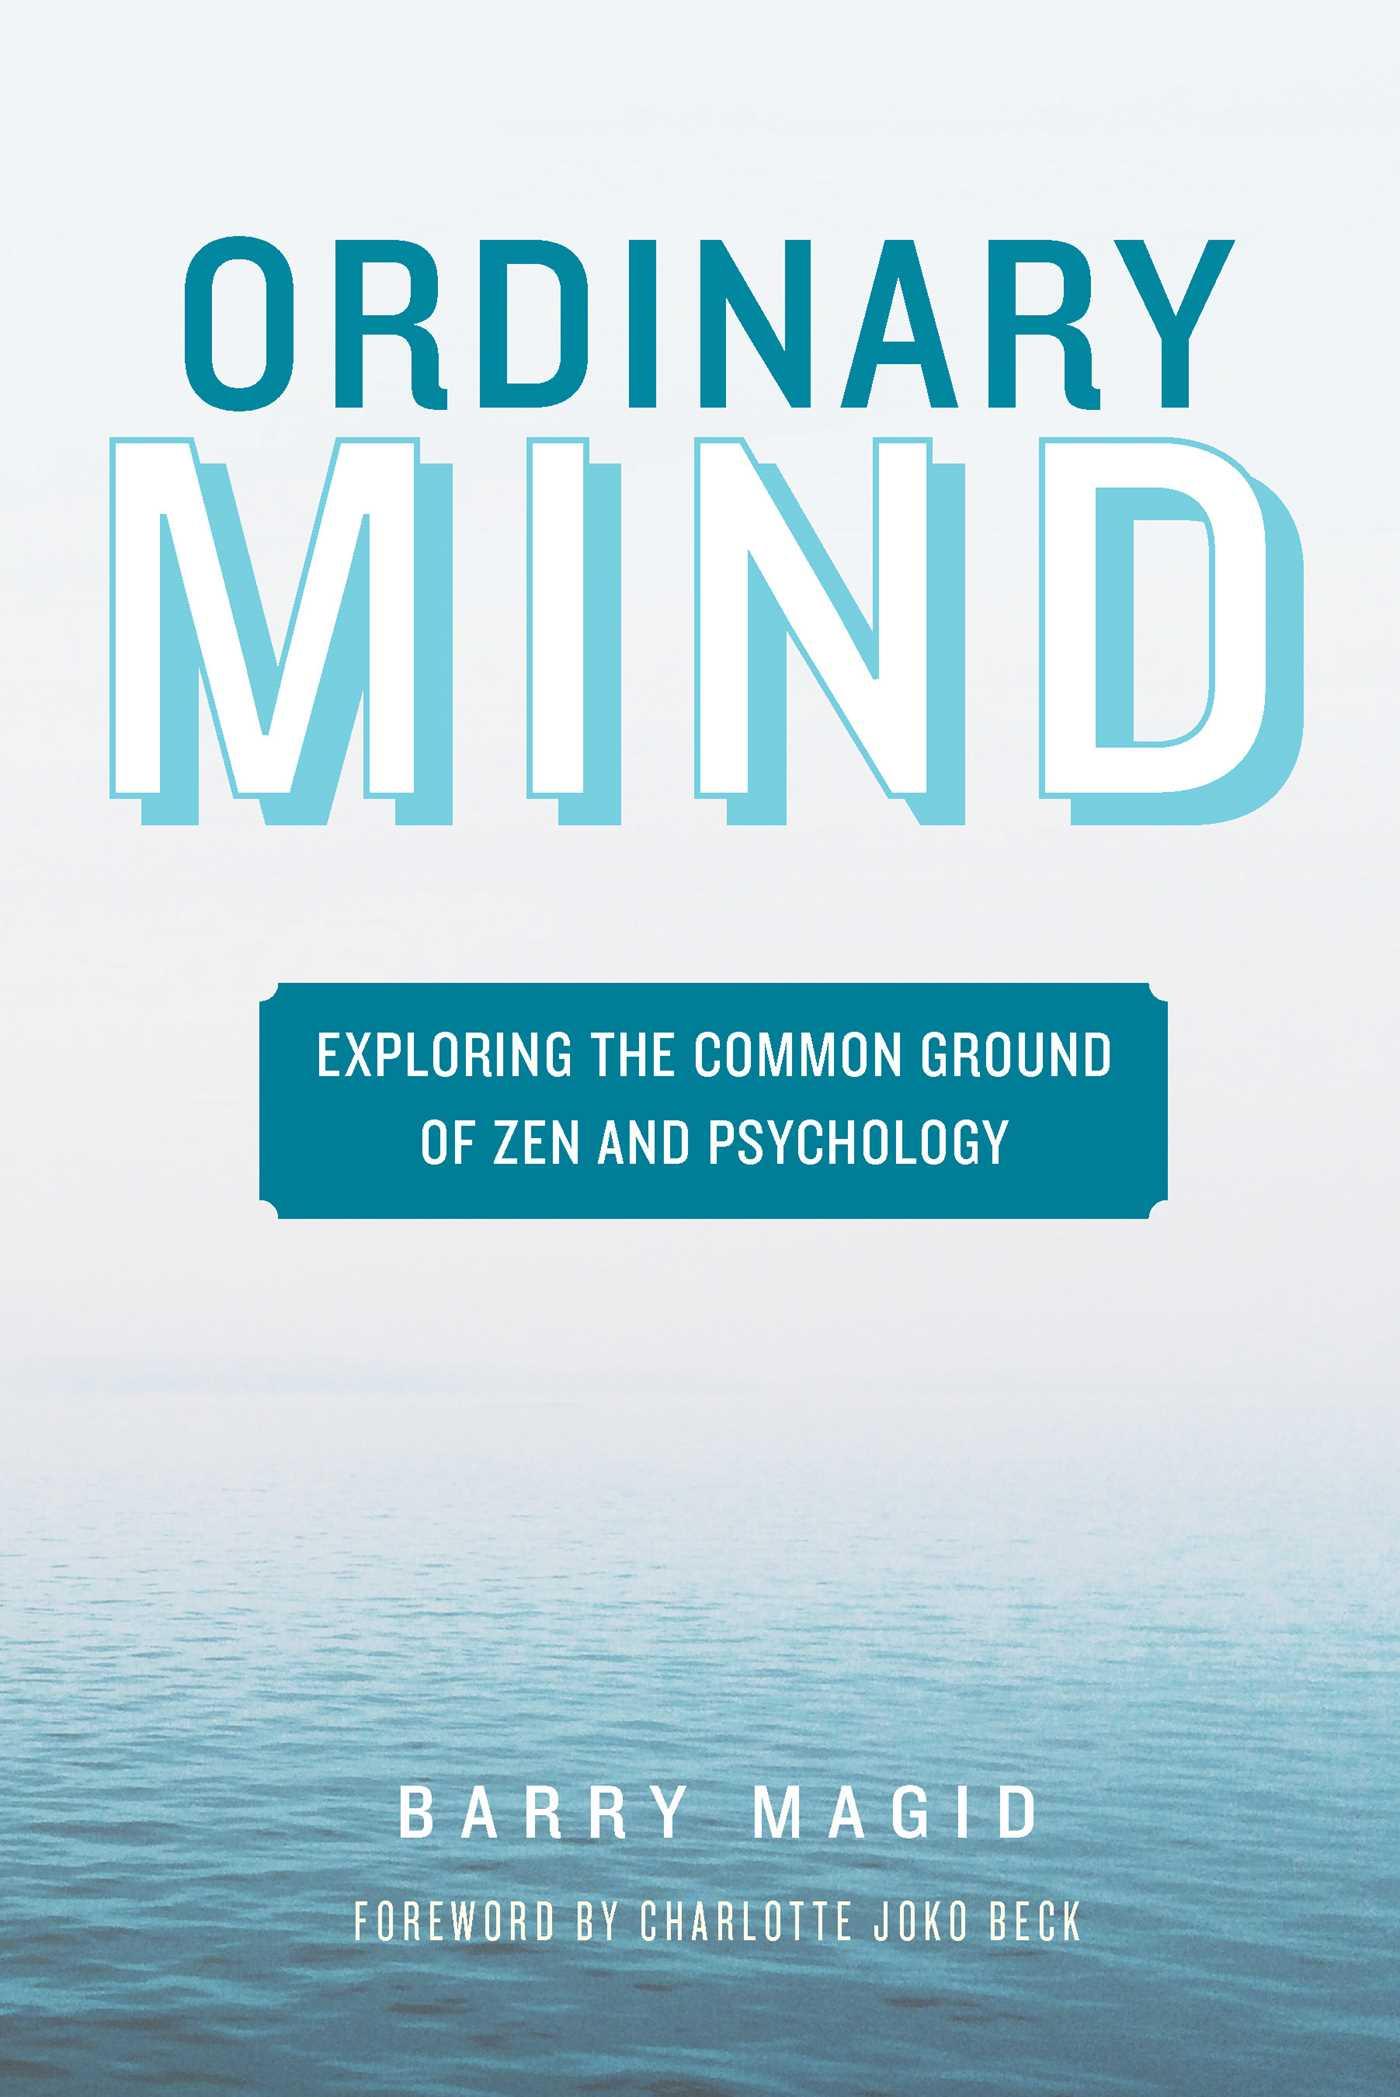 Ordinary mind 9780861714957 hr